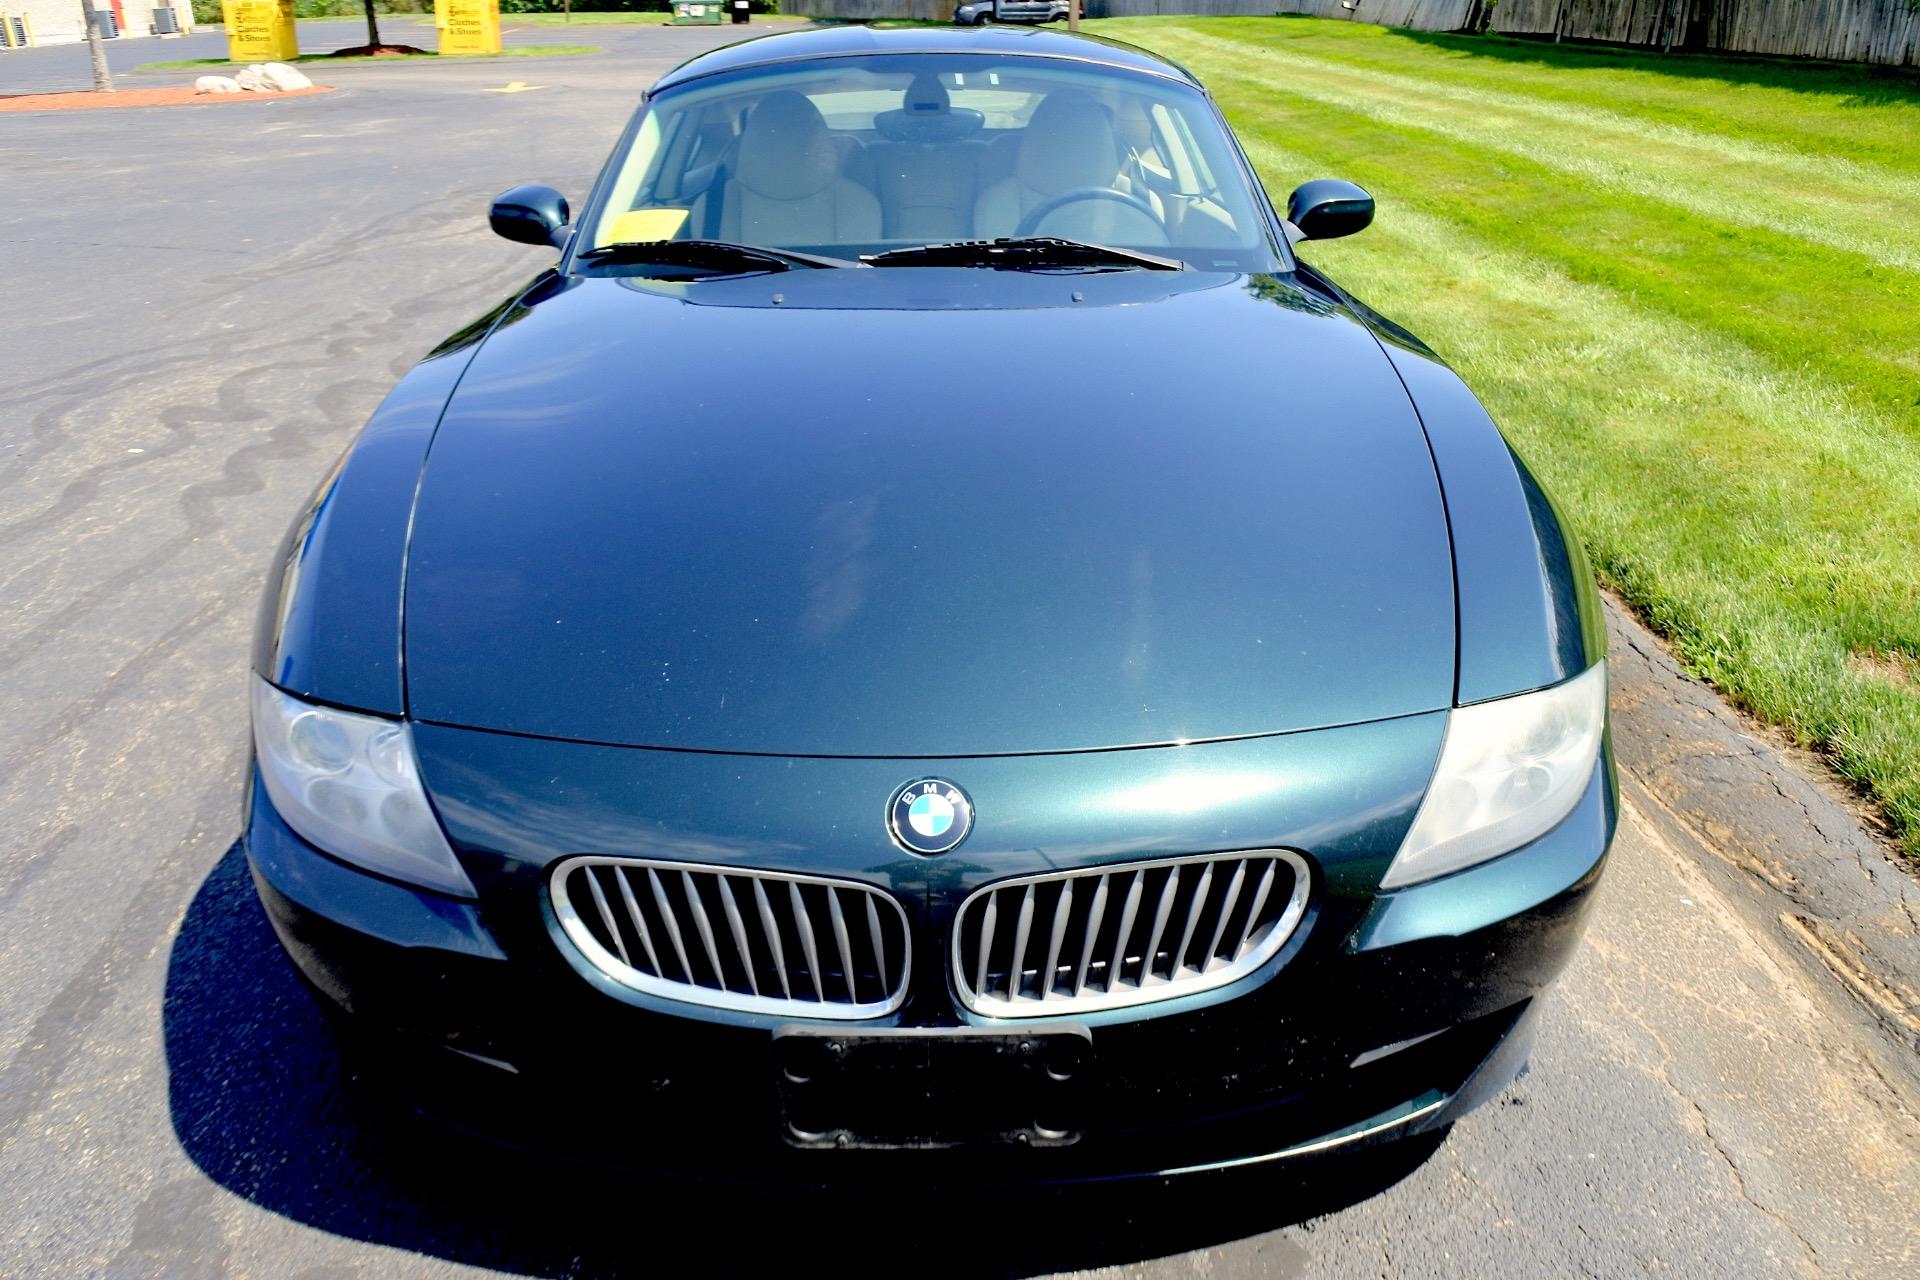 Used 2007 BMW Z4 2dr Coupe 3.0si Used 2007 BMW Z4 2dr Coupe 3.0si for sale  at Metro West Motorcars LLC in Shrewsbury MA 8